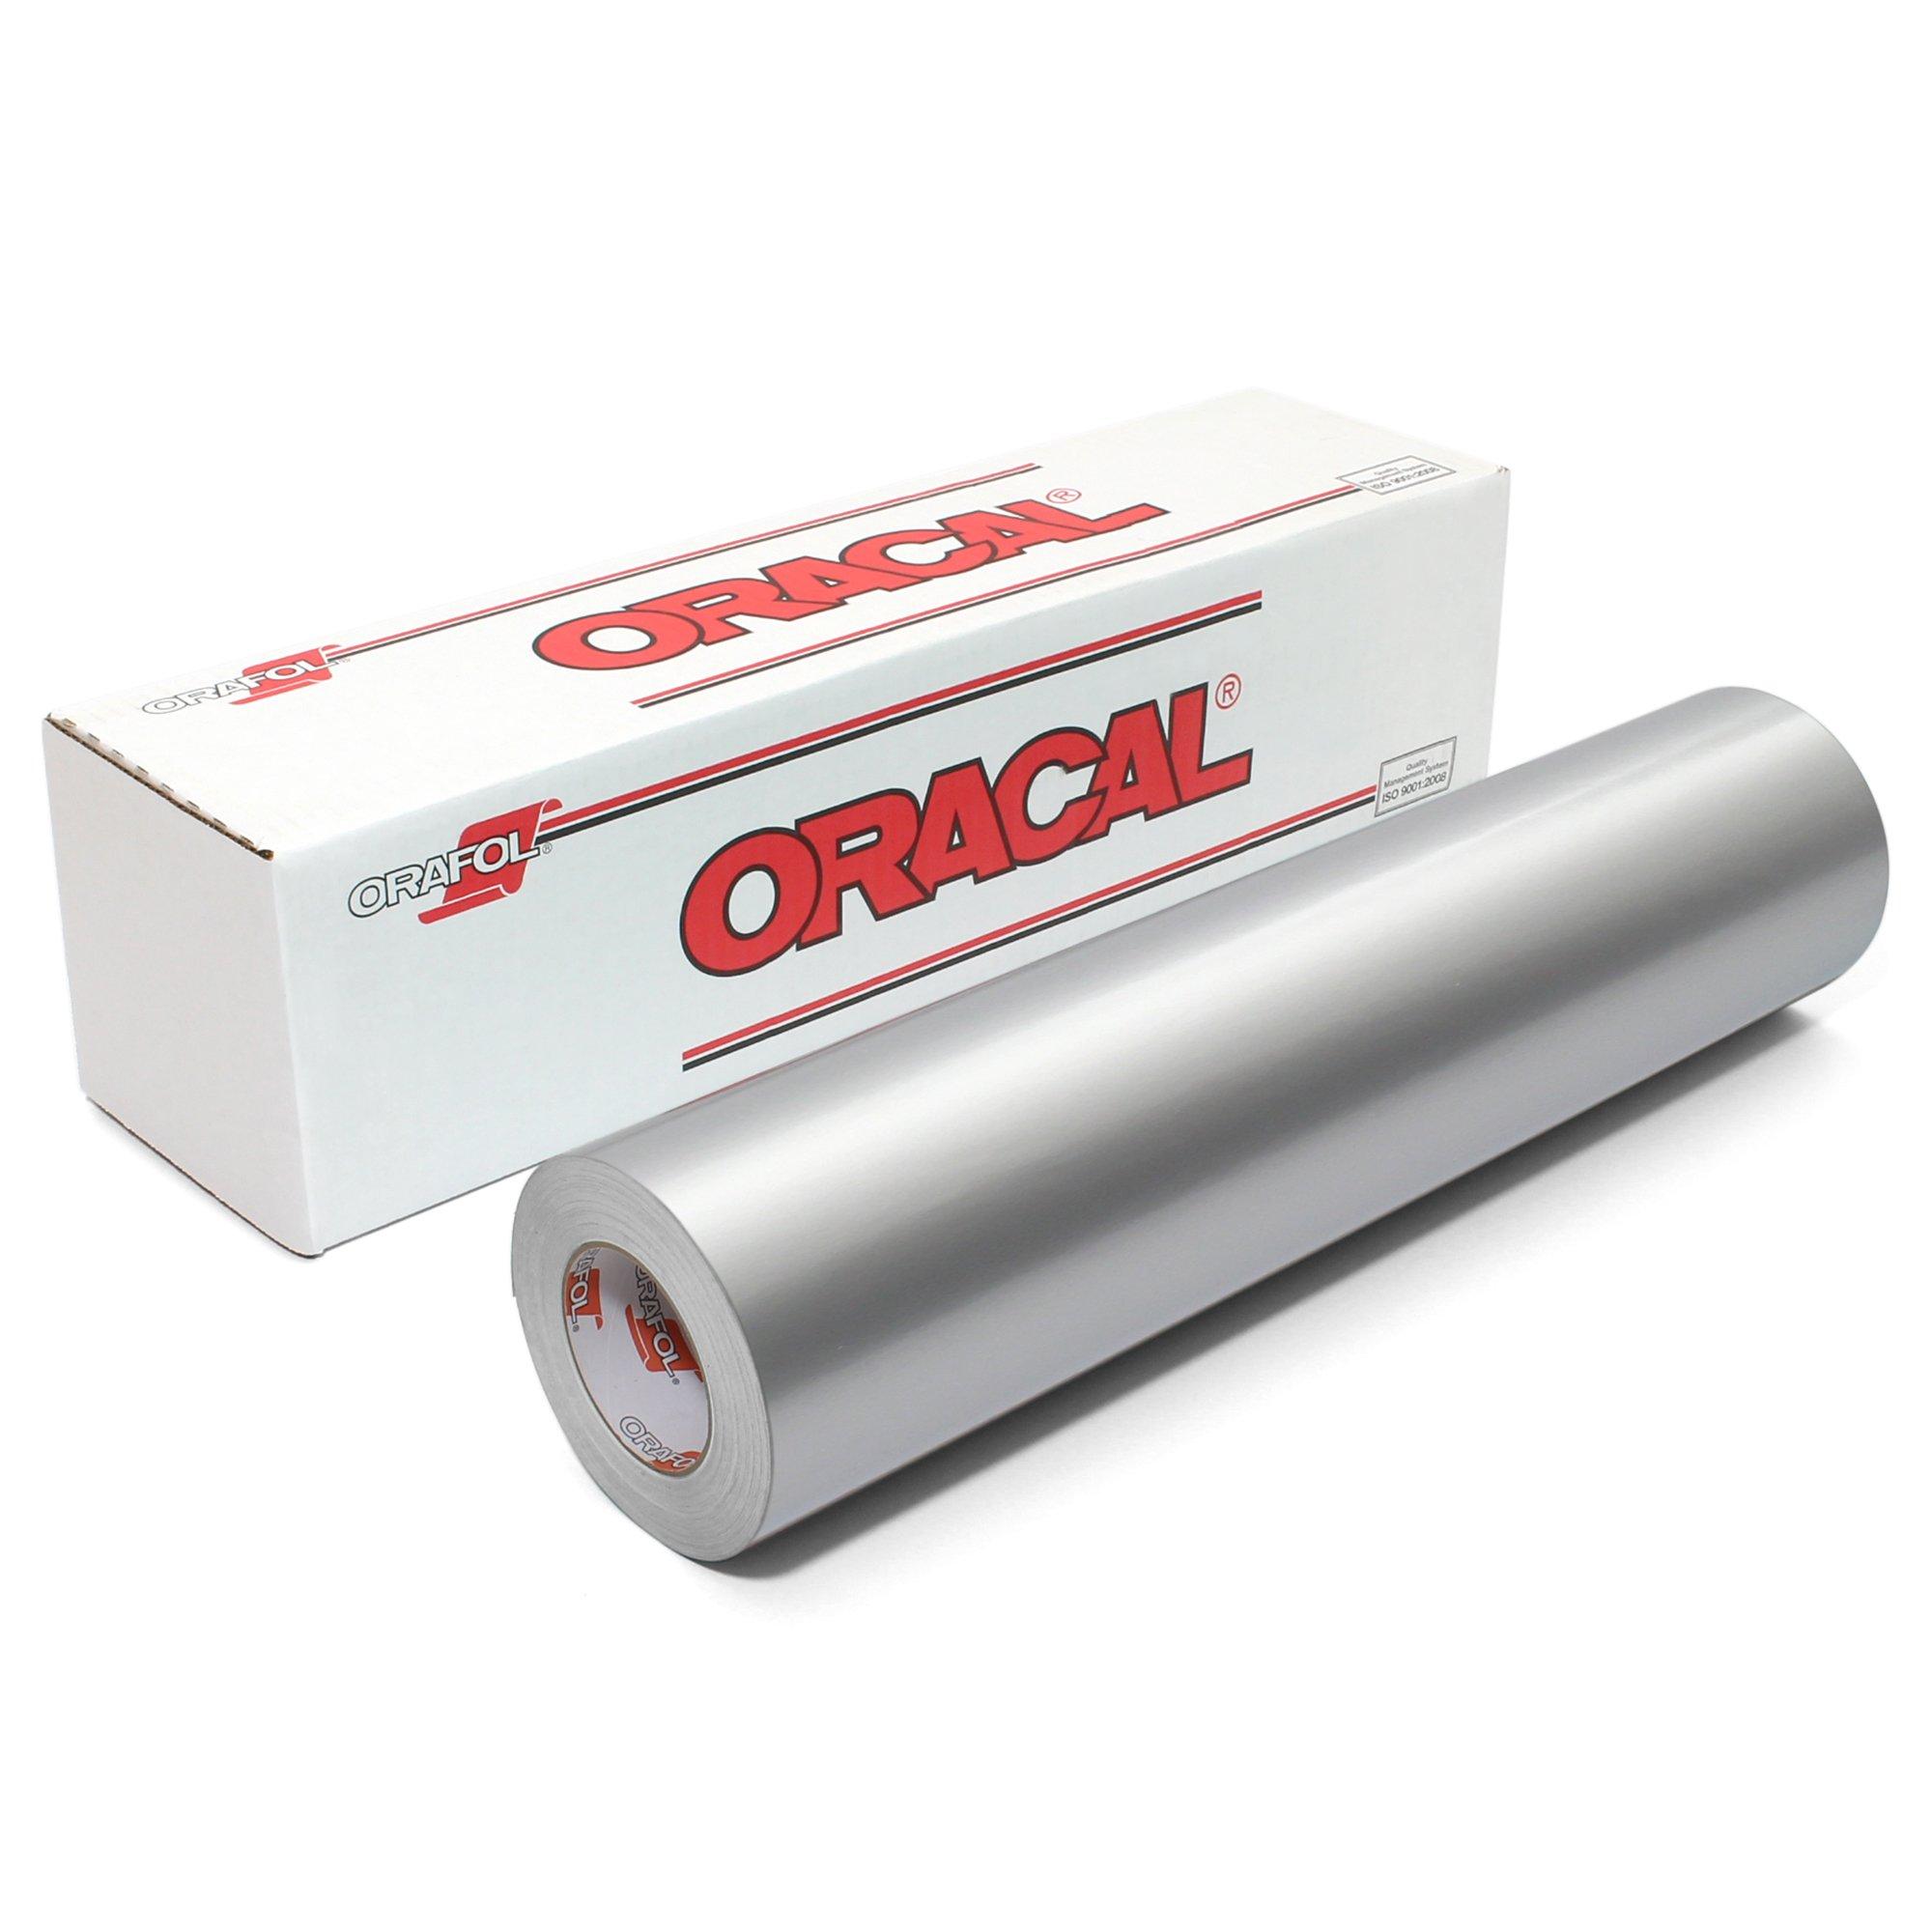 Oracal 651 Glossy Vinyl Roll 24 Inches by 150 Feet - Silver Grey (metallic)